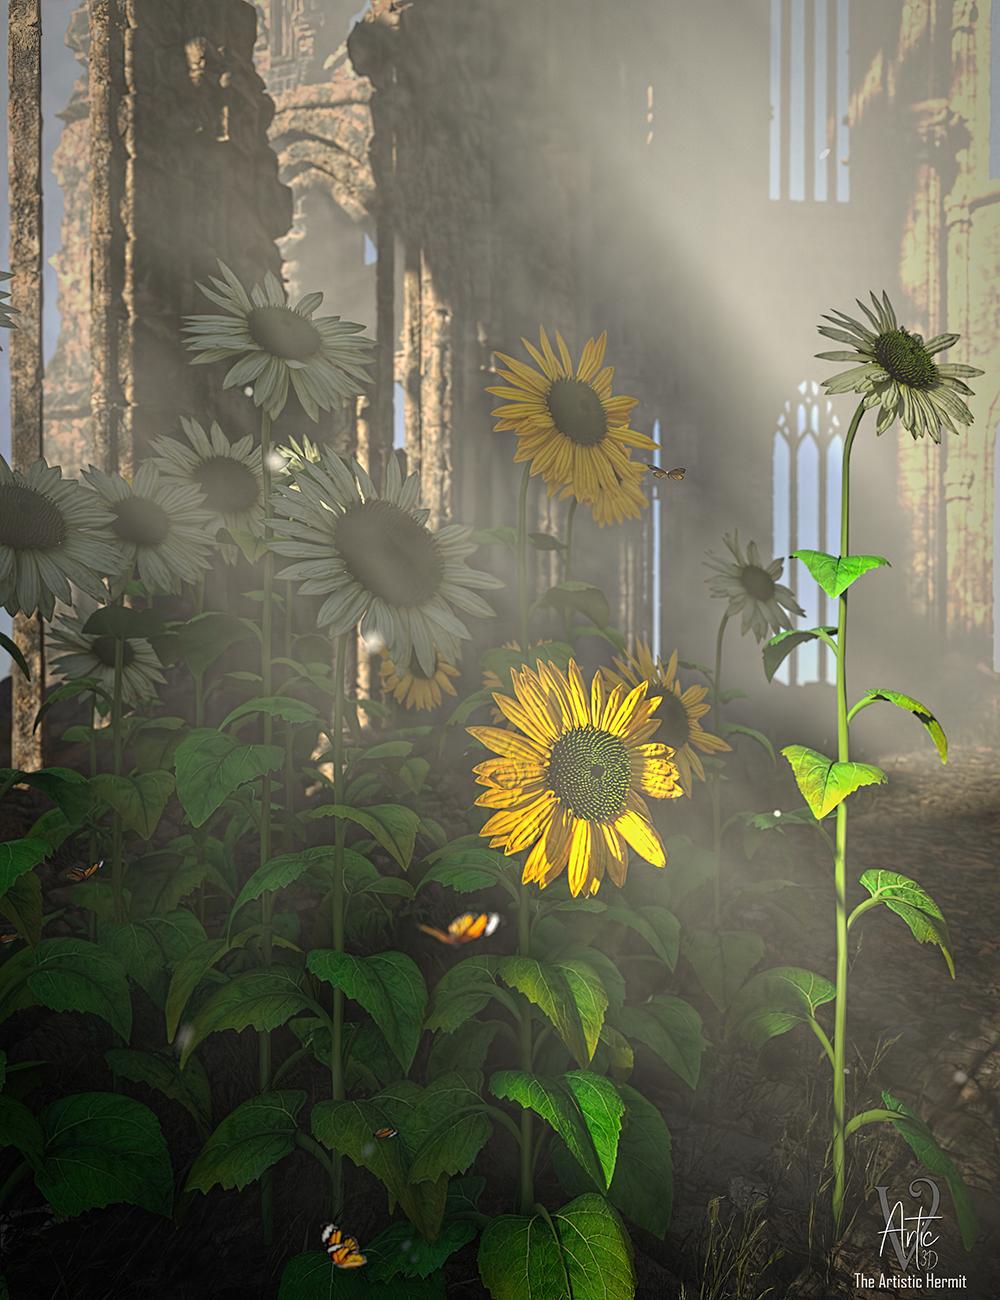 Sunshine-poster-4-vArtic3D-c8a6fc16